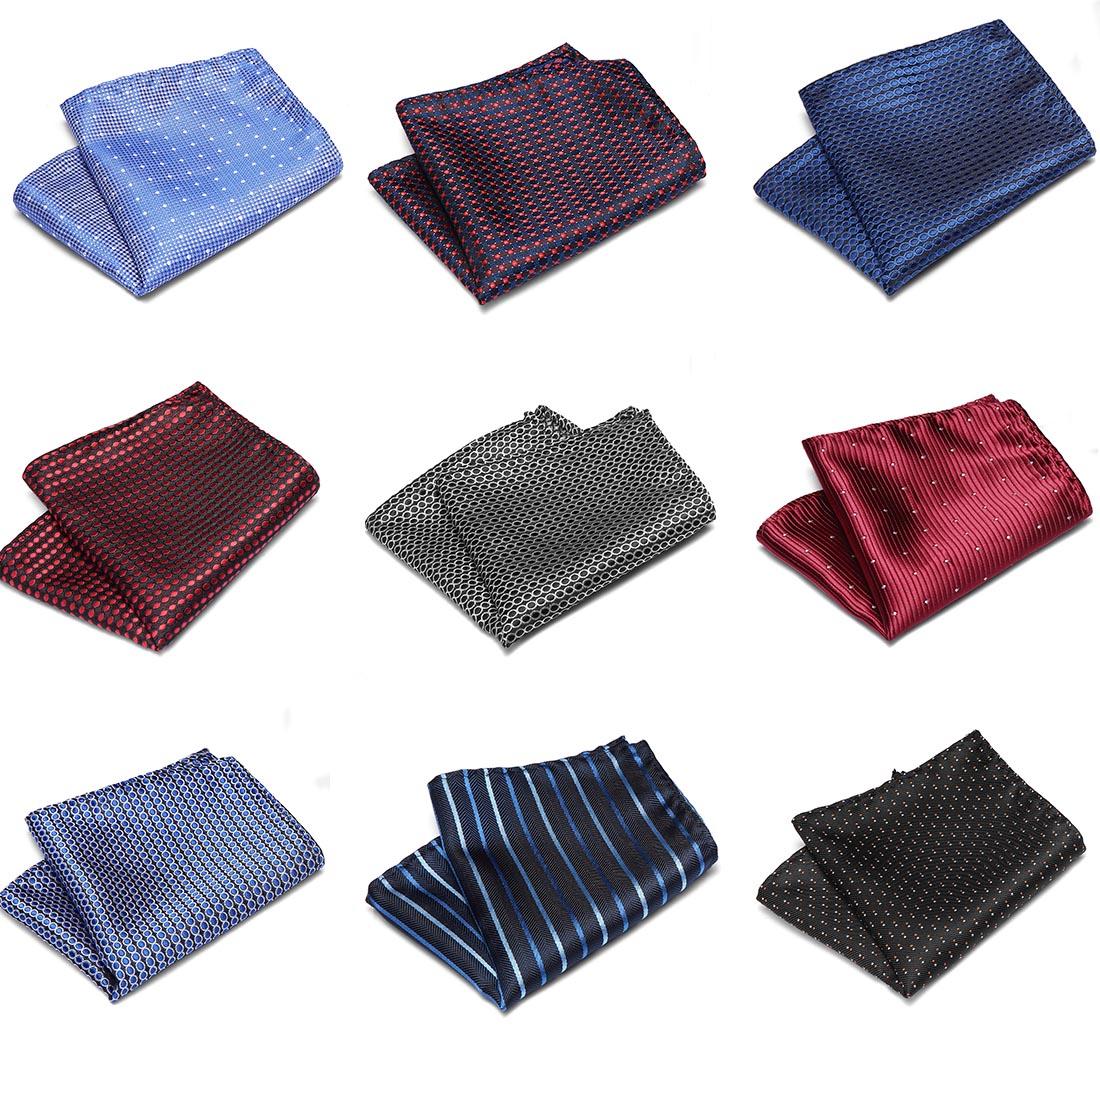 2020 Classic  Hankerchief  Scarves Vintage Silk  Paisley Hankies Men's Pocket Square Handkerchiefs Chest Towel